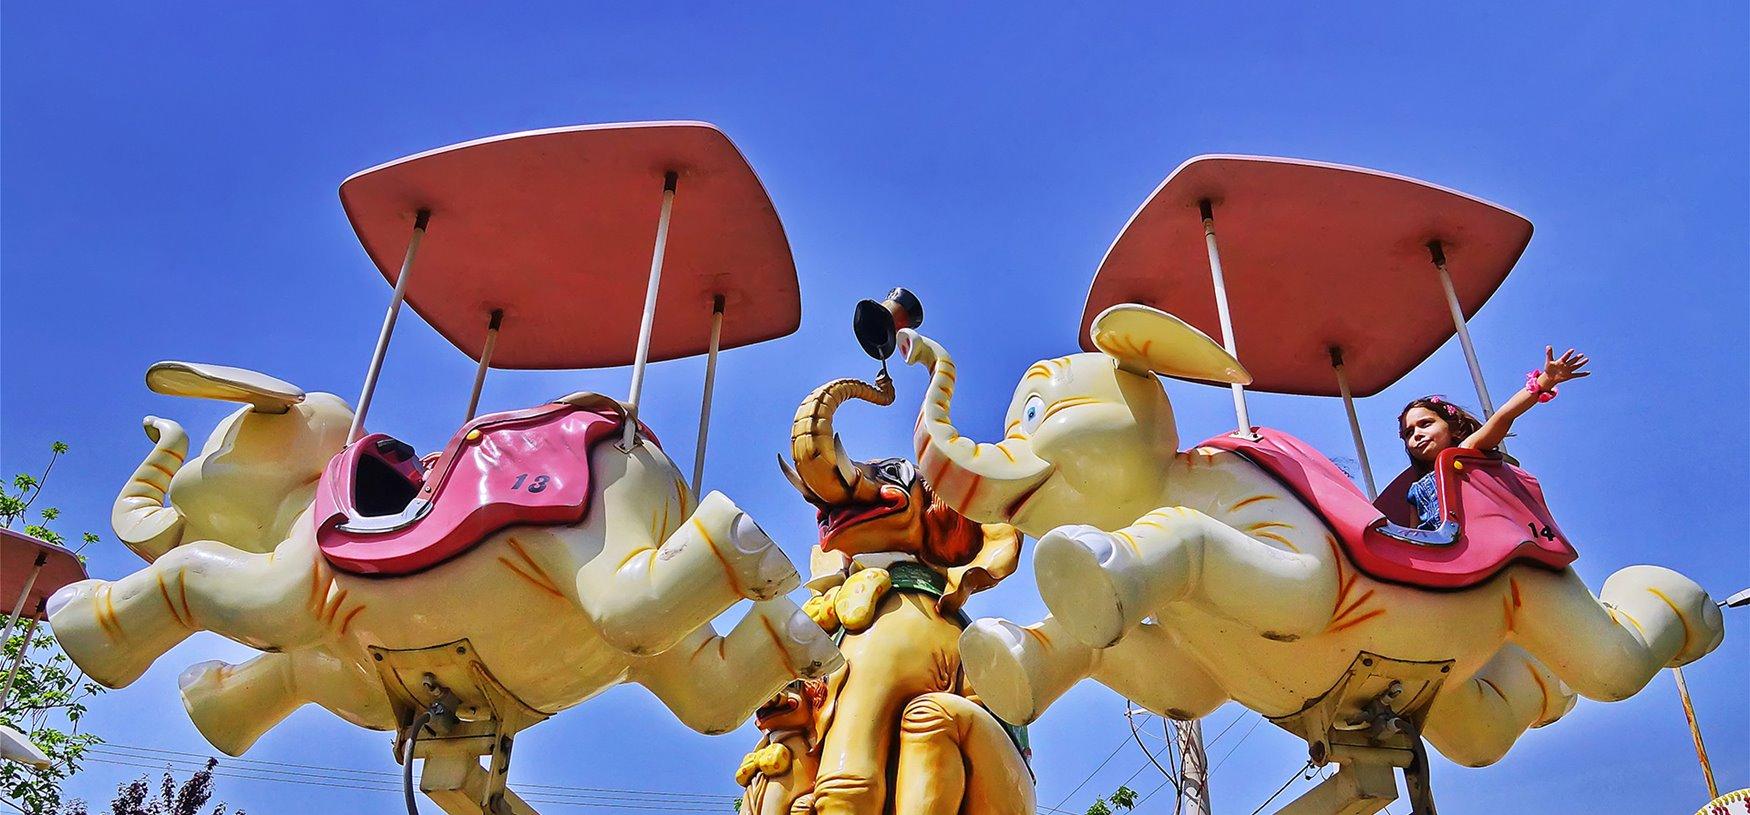 Фото карусели Веселый слон